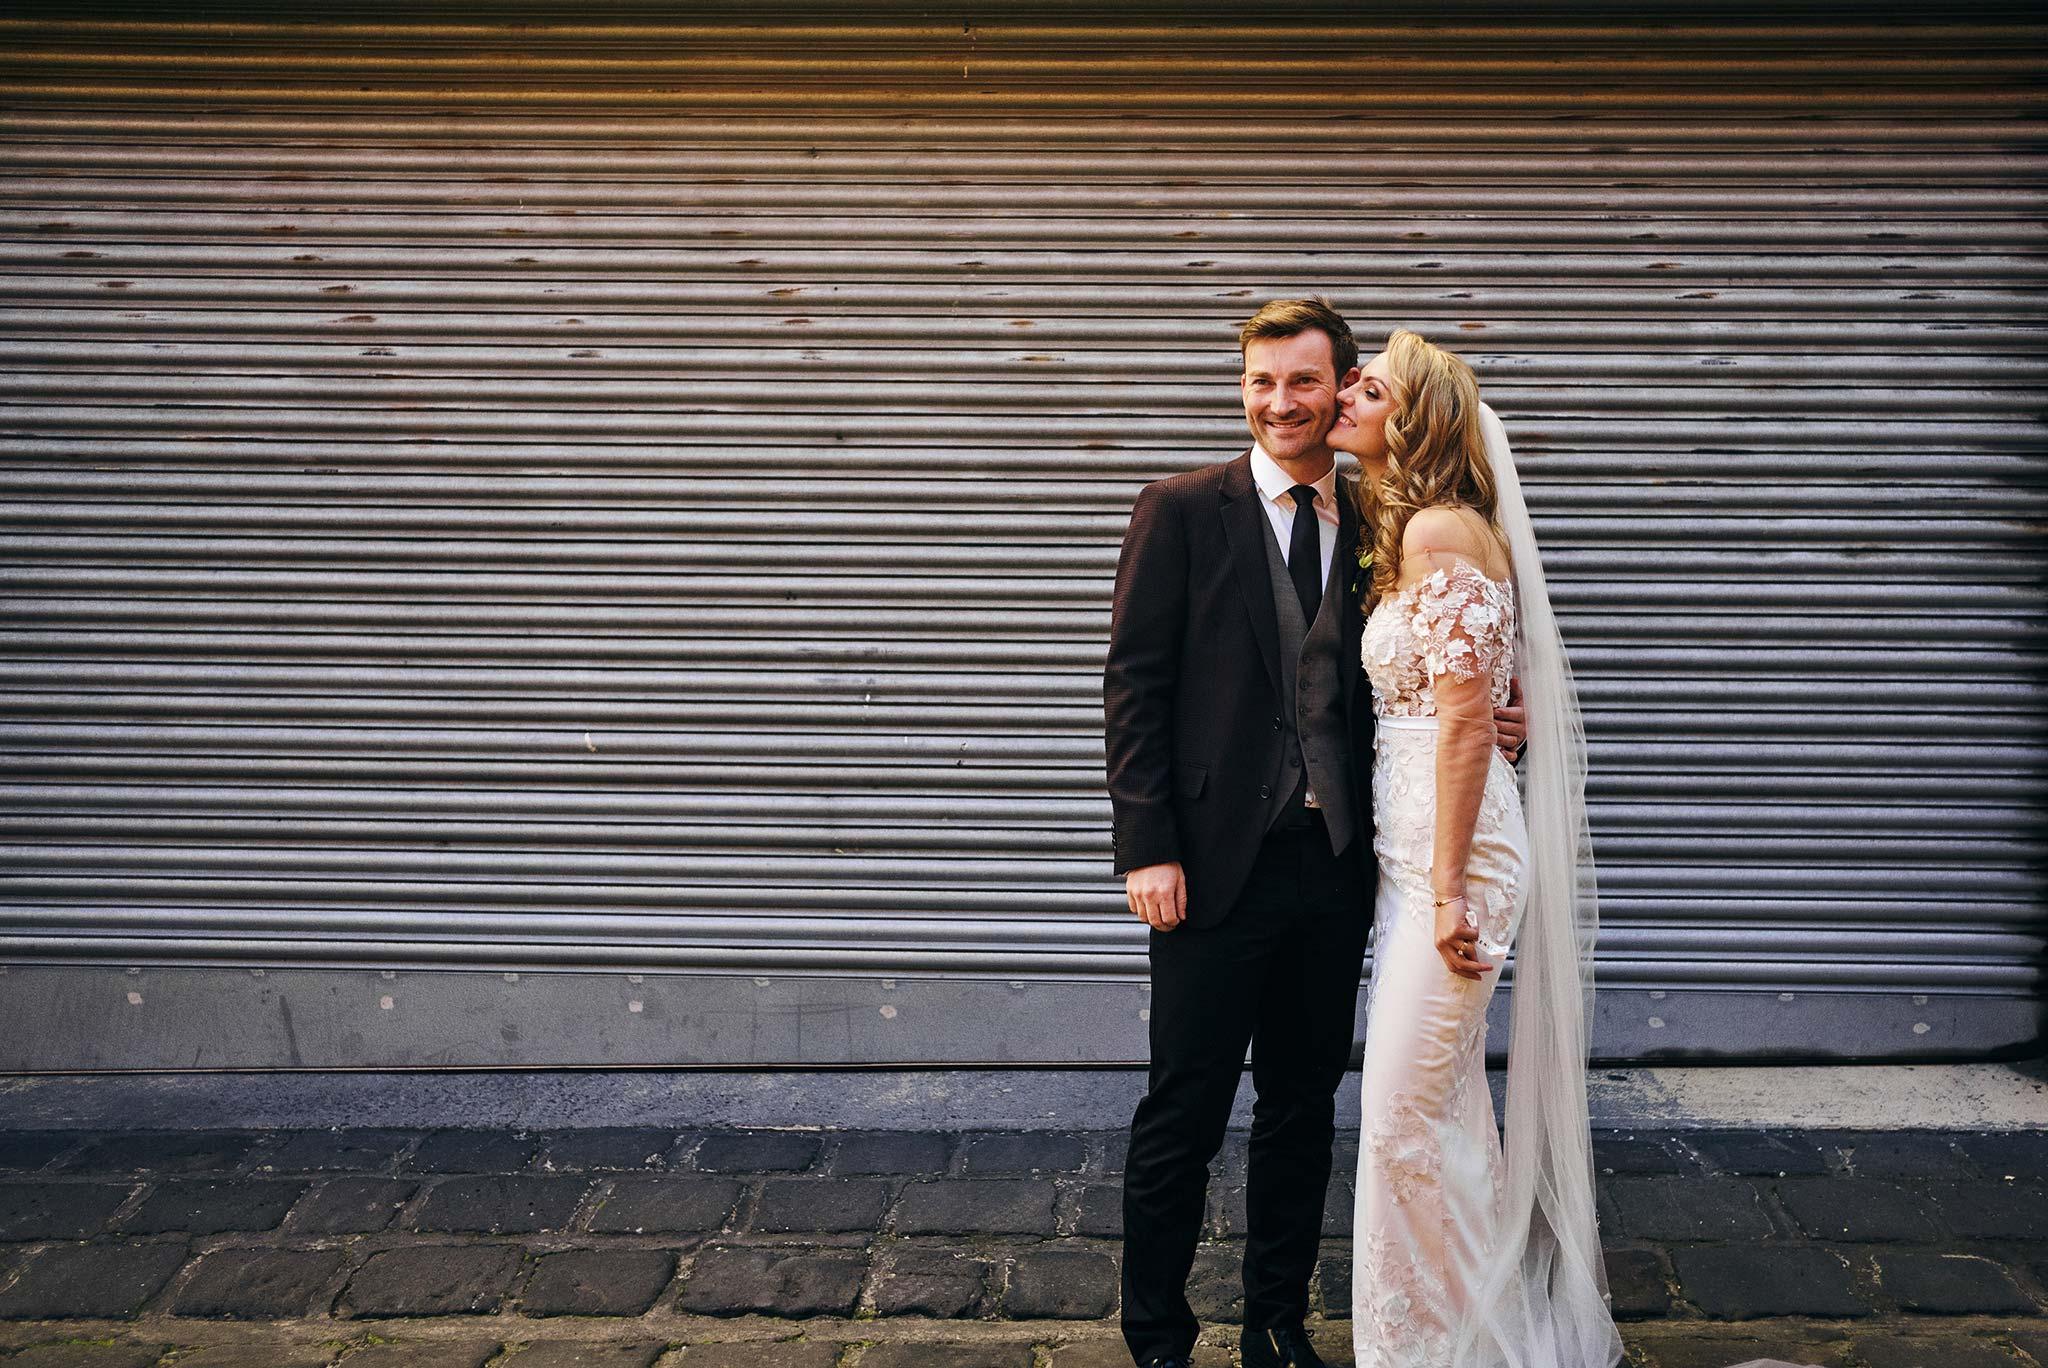 Melbourne-Wedding-Photographer-smartartz-gallery-ceremony-bride-groom